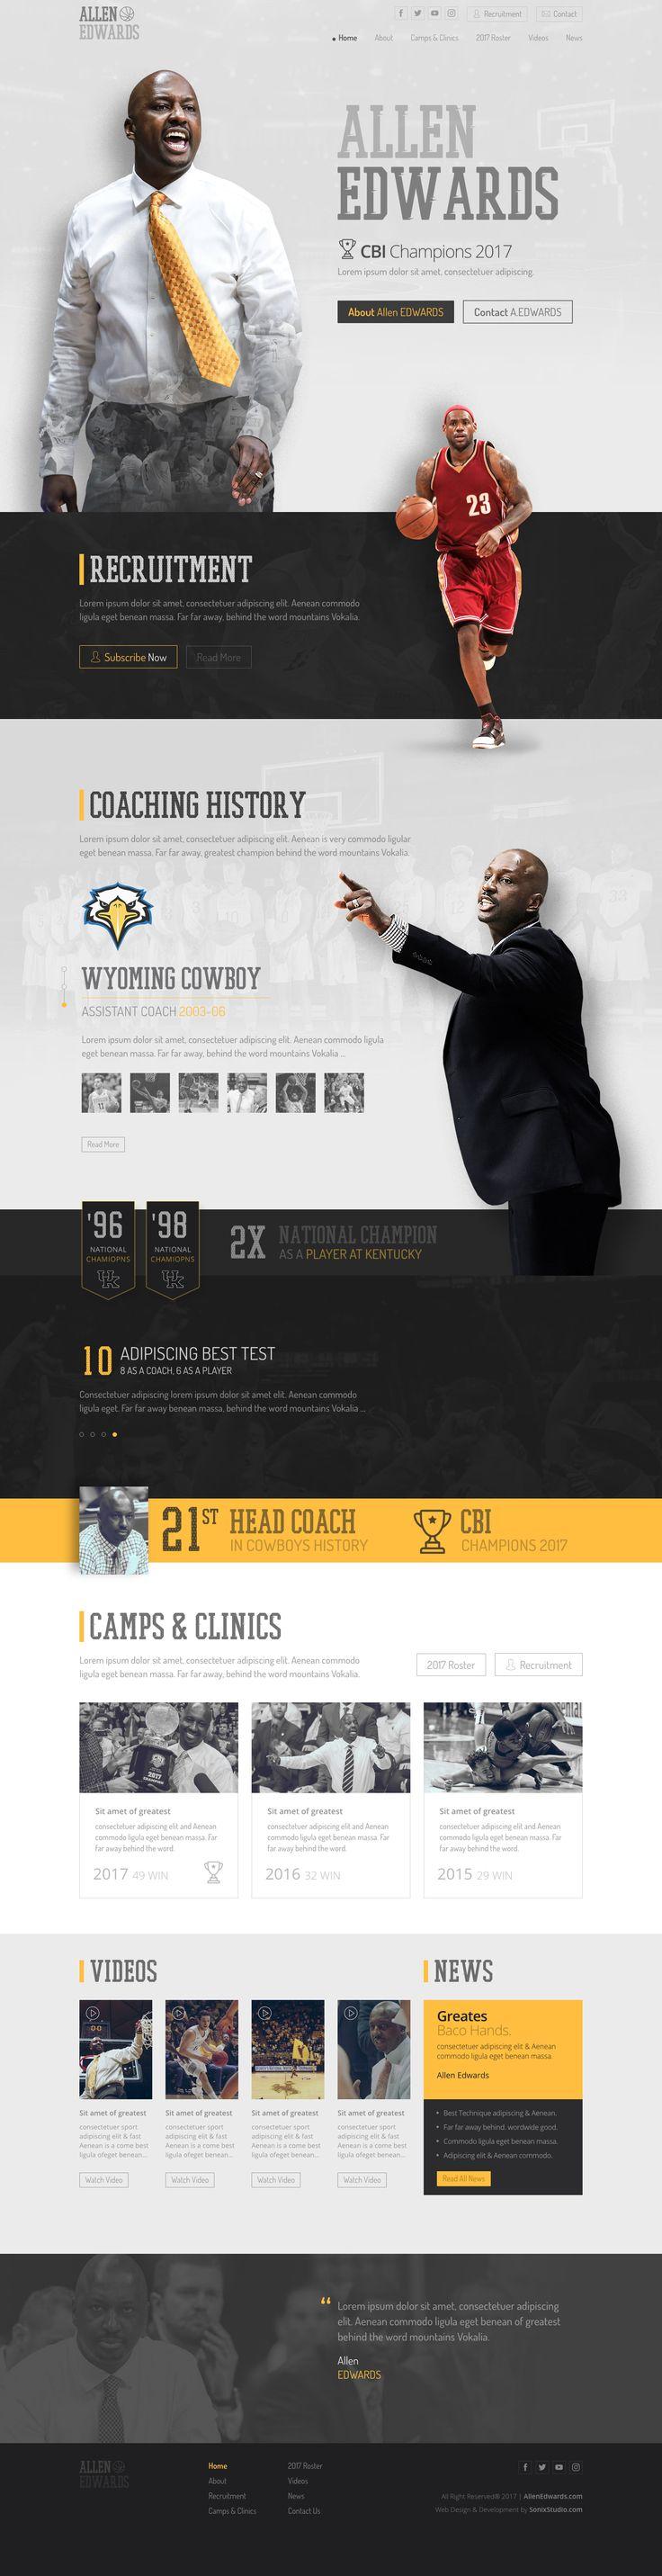 Black, White & Yellow Web design plus the Html for Allen Edwards   - basketball Coach - CBI Champions 2017 with Wyoming Cowboys team. #parallaxWebDesign, #parallax, #sportwebdesign, #sport,  #CBIChampionsCoach,  #basketballwebsite, #basketballWebDesign, #basketball, #basketballcoach, #CoachAllenEdwards, #webdesign, #websitedesign, #webDesigner, #CBIChompions, #sportwebsite, #psdtohtml, #frontenddeveloper, #webdeveloper